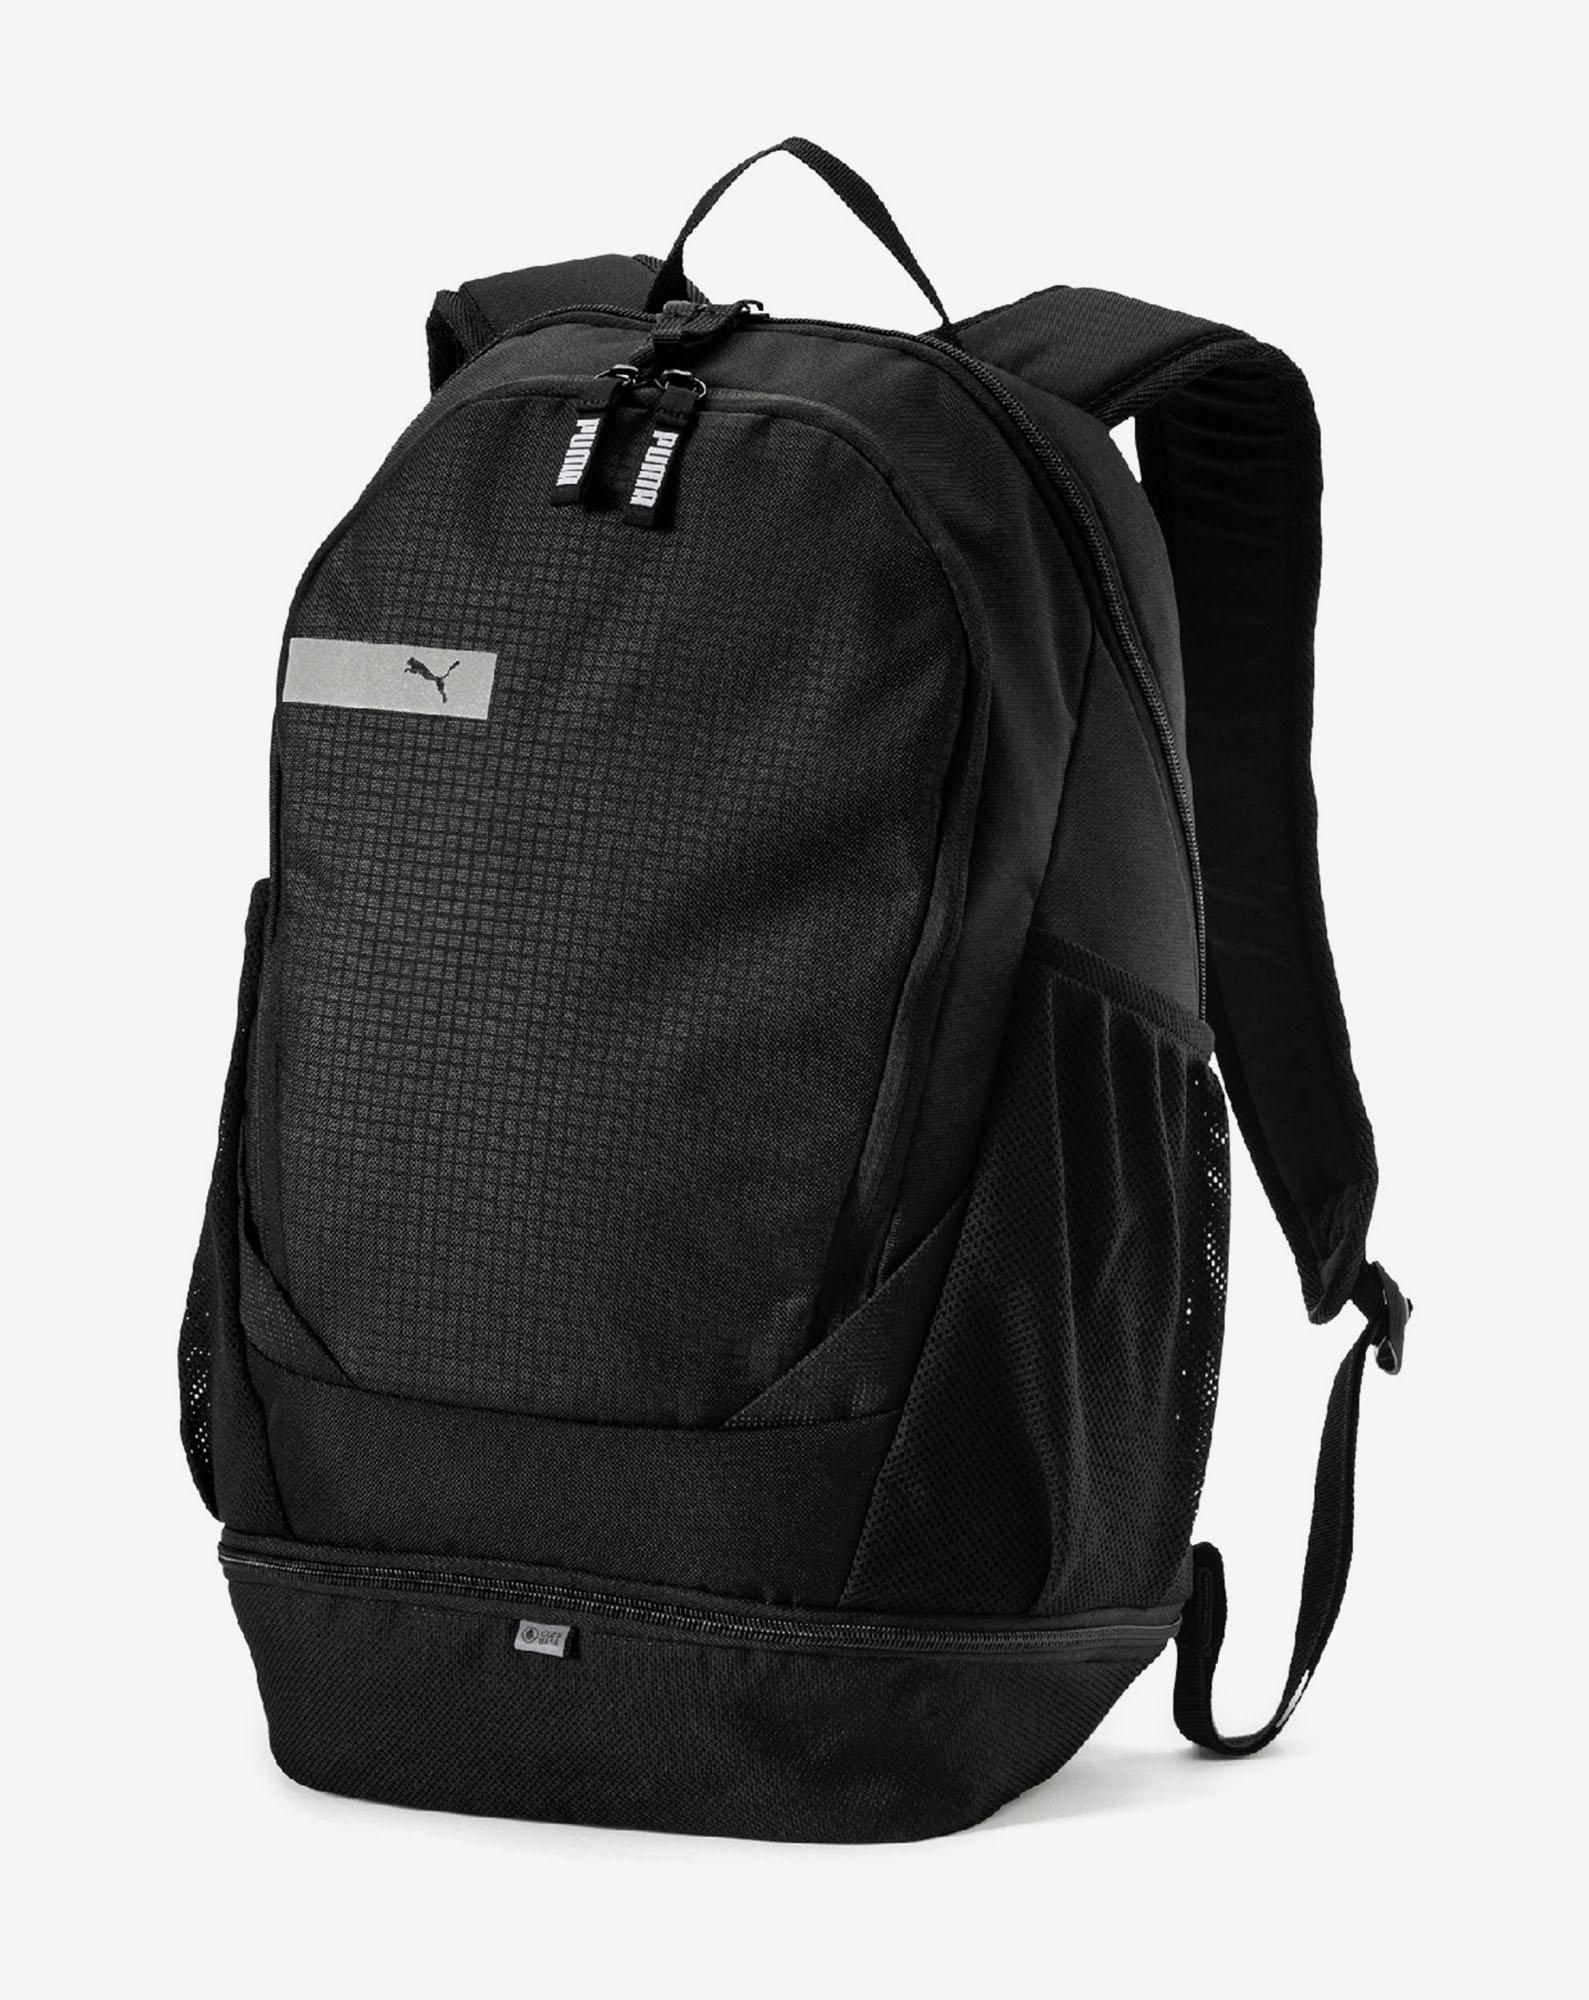 5d956e68d1 detail PUMA Vibe Backpack